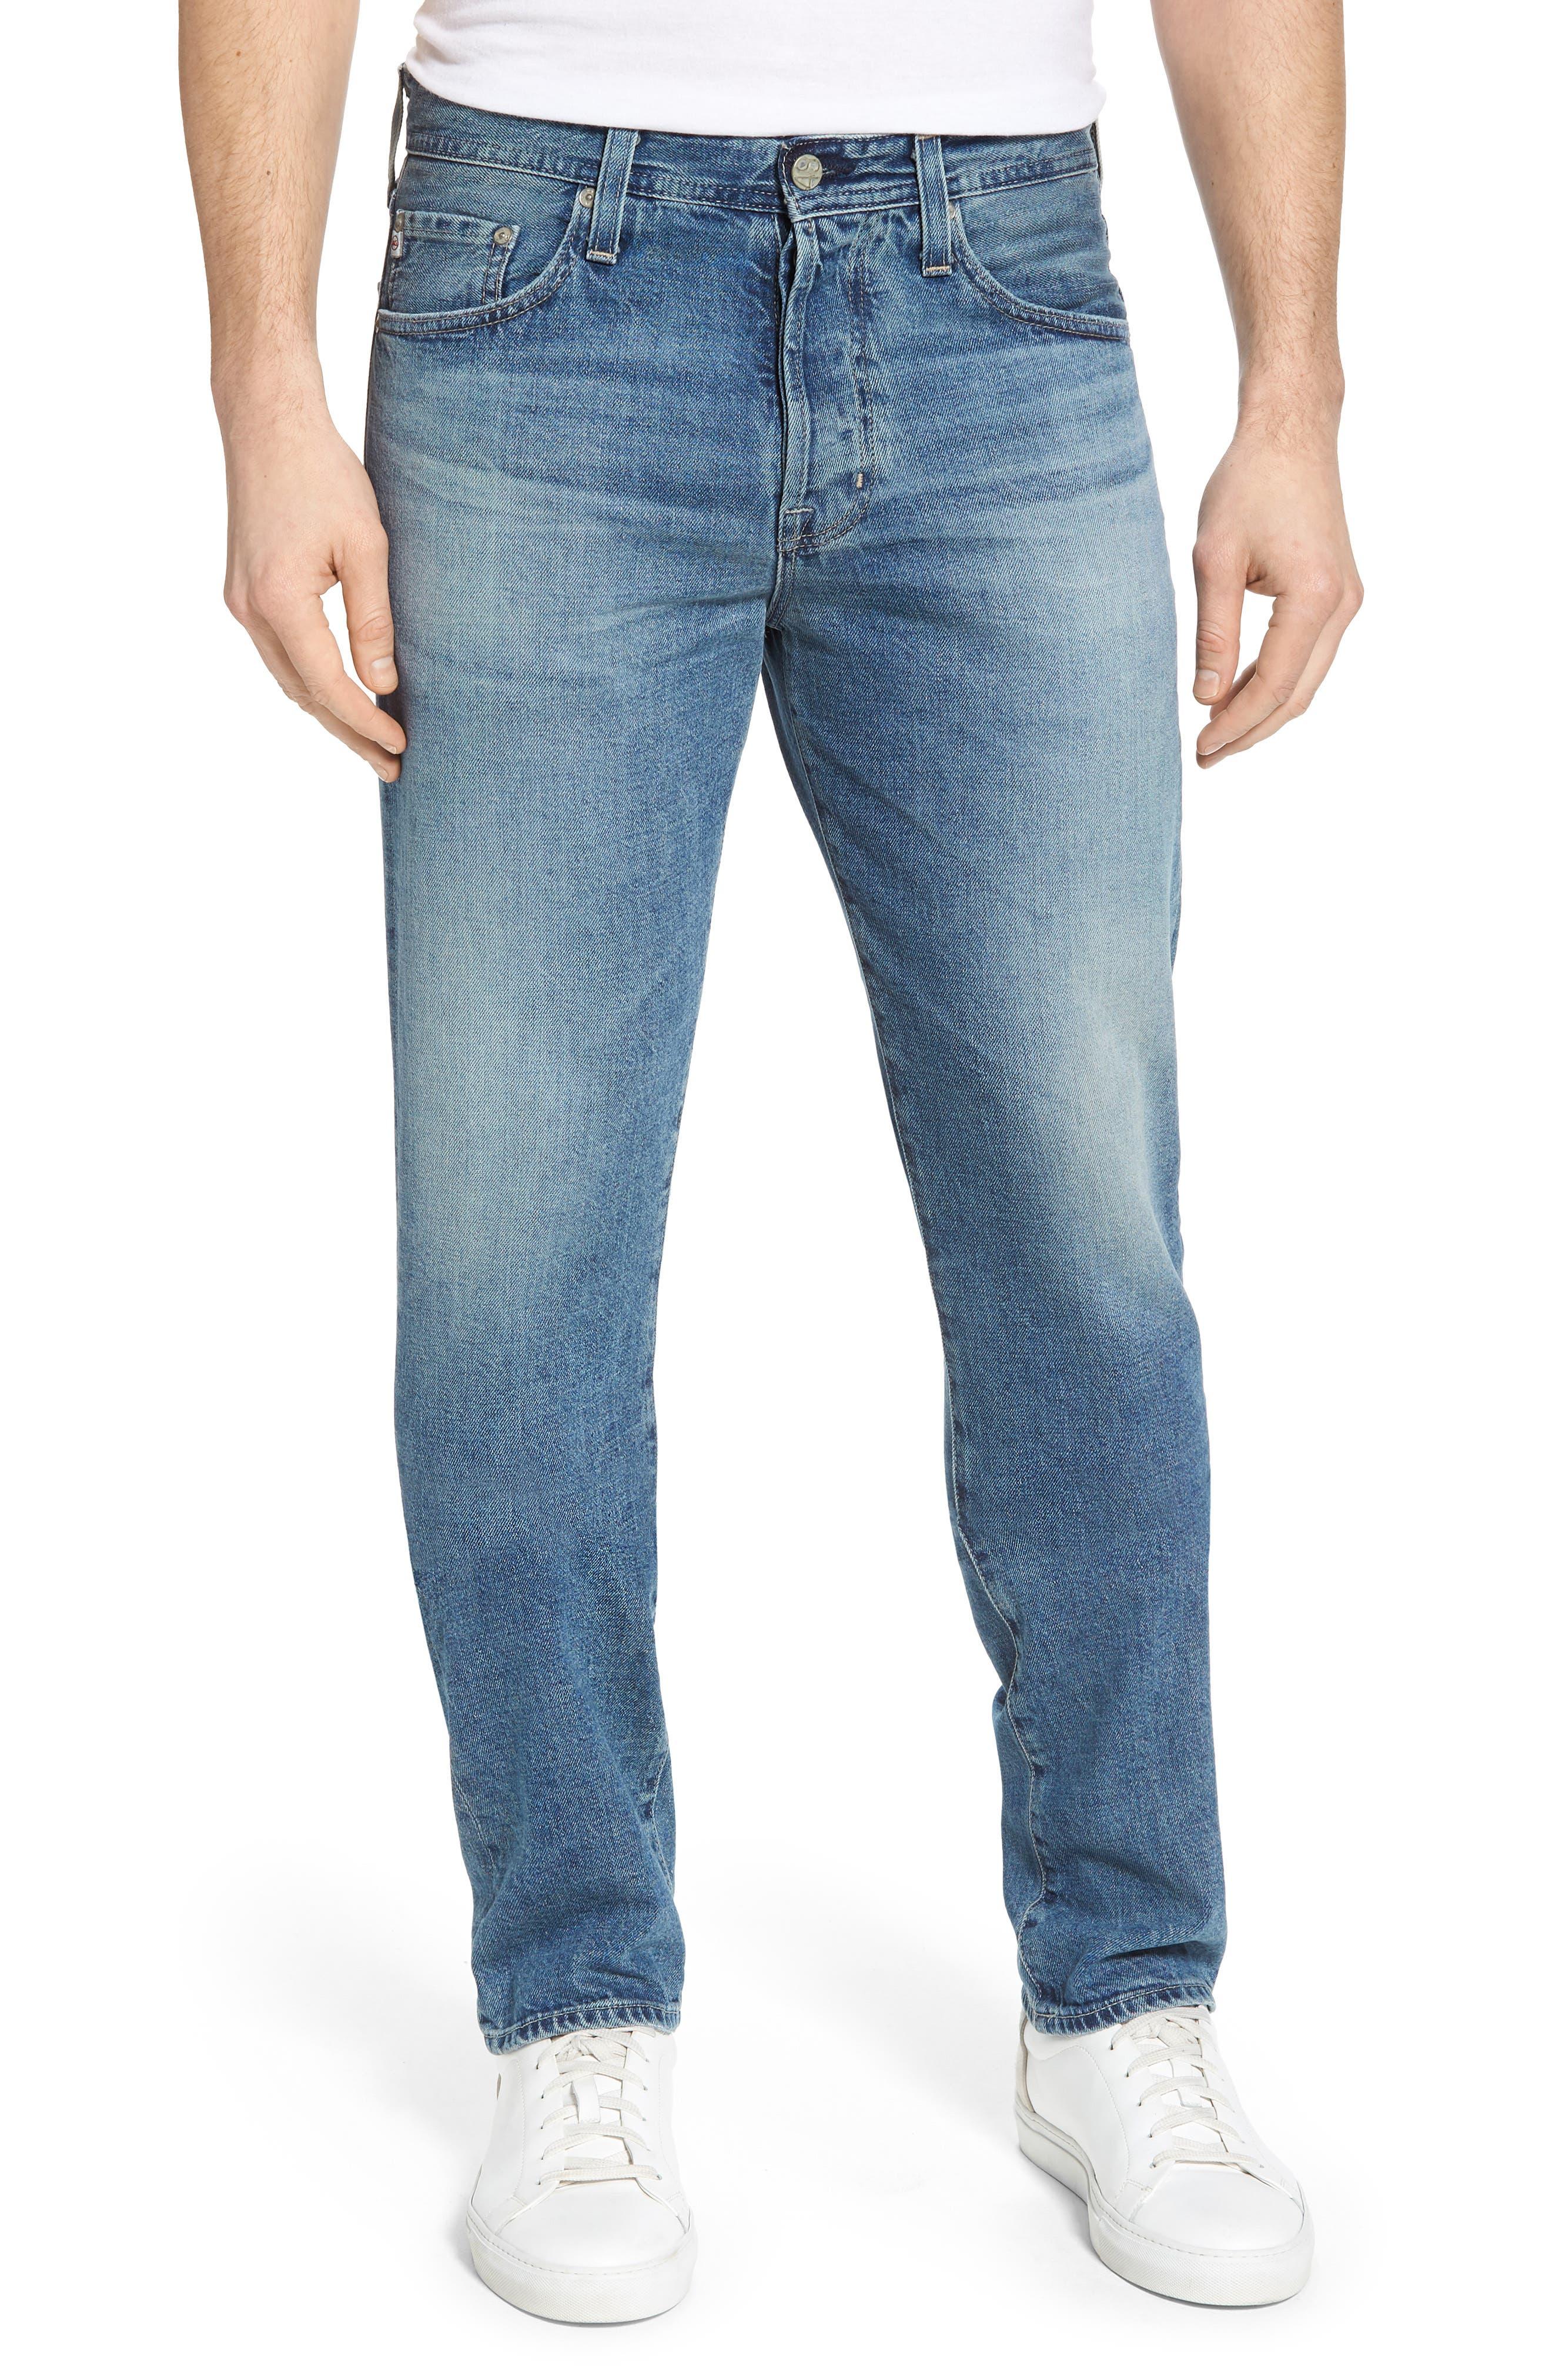 Pipe Slim Straight Leg Jeans,                         Main,                         color, 464